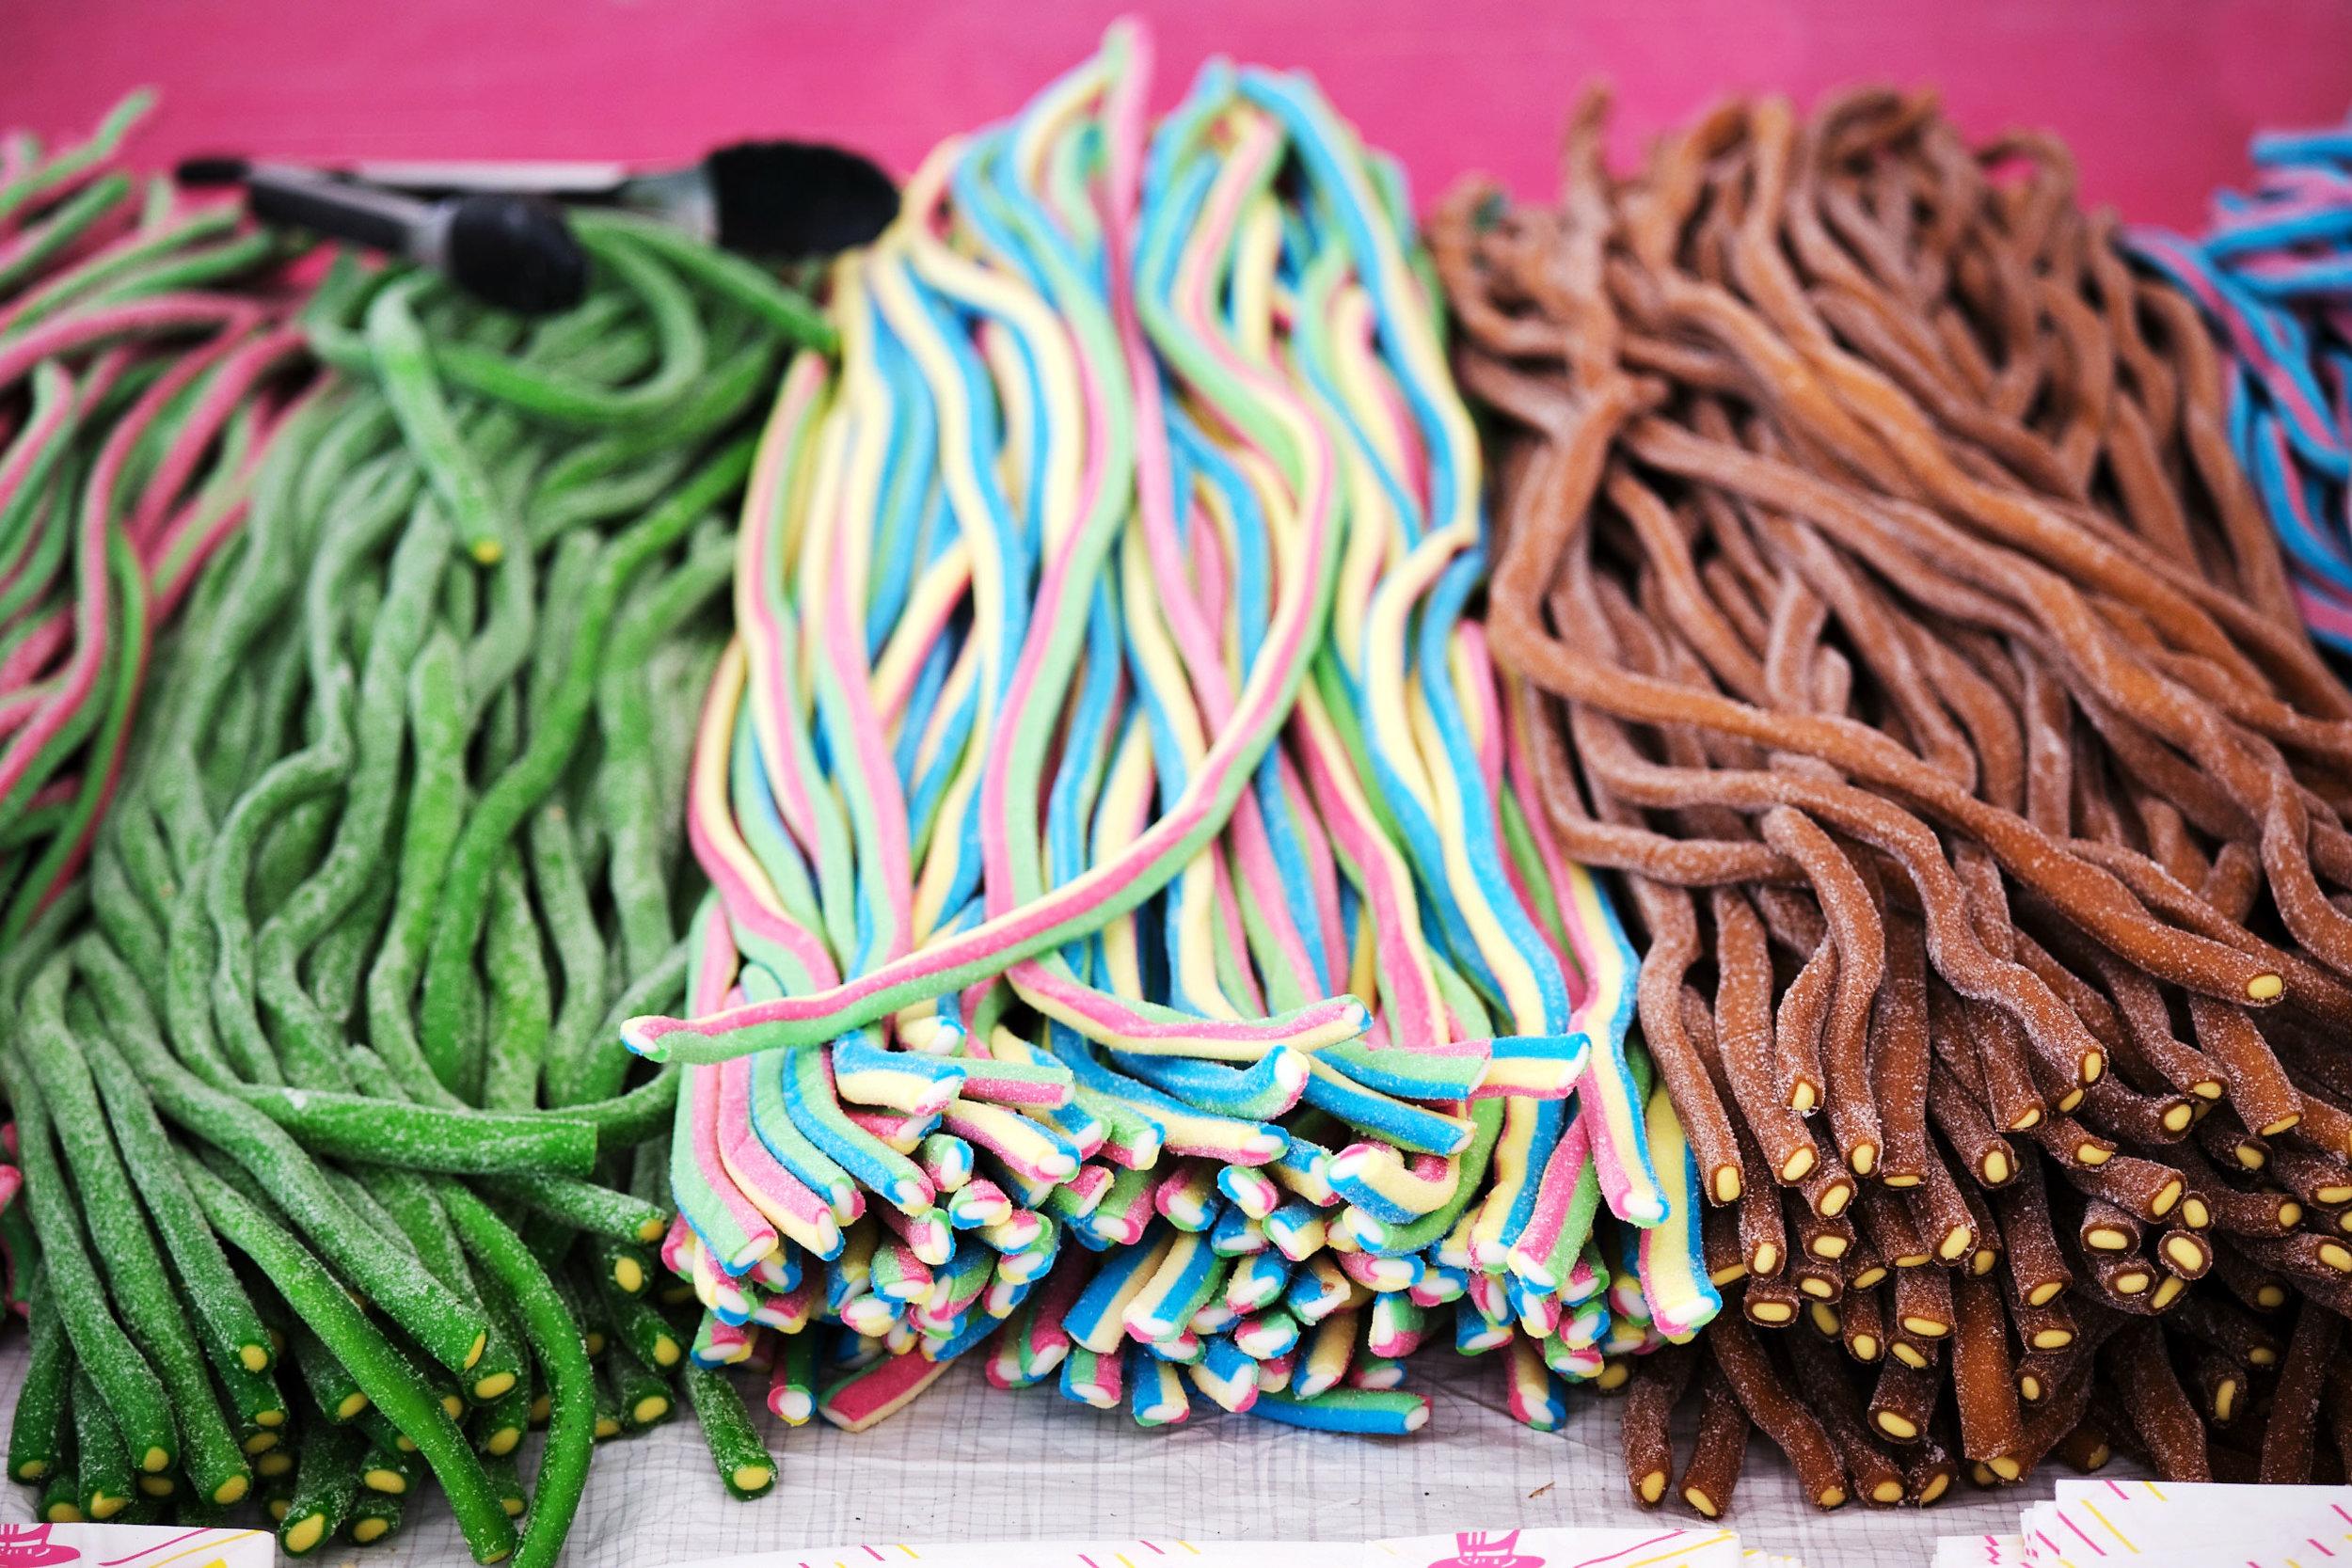 Colourful-candy.jpg